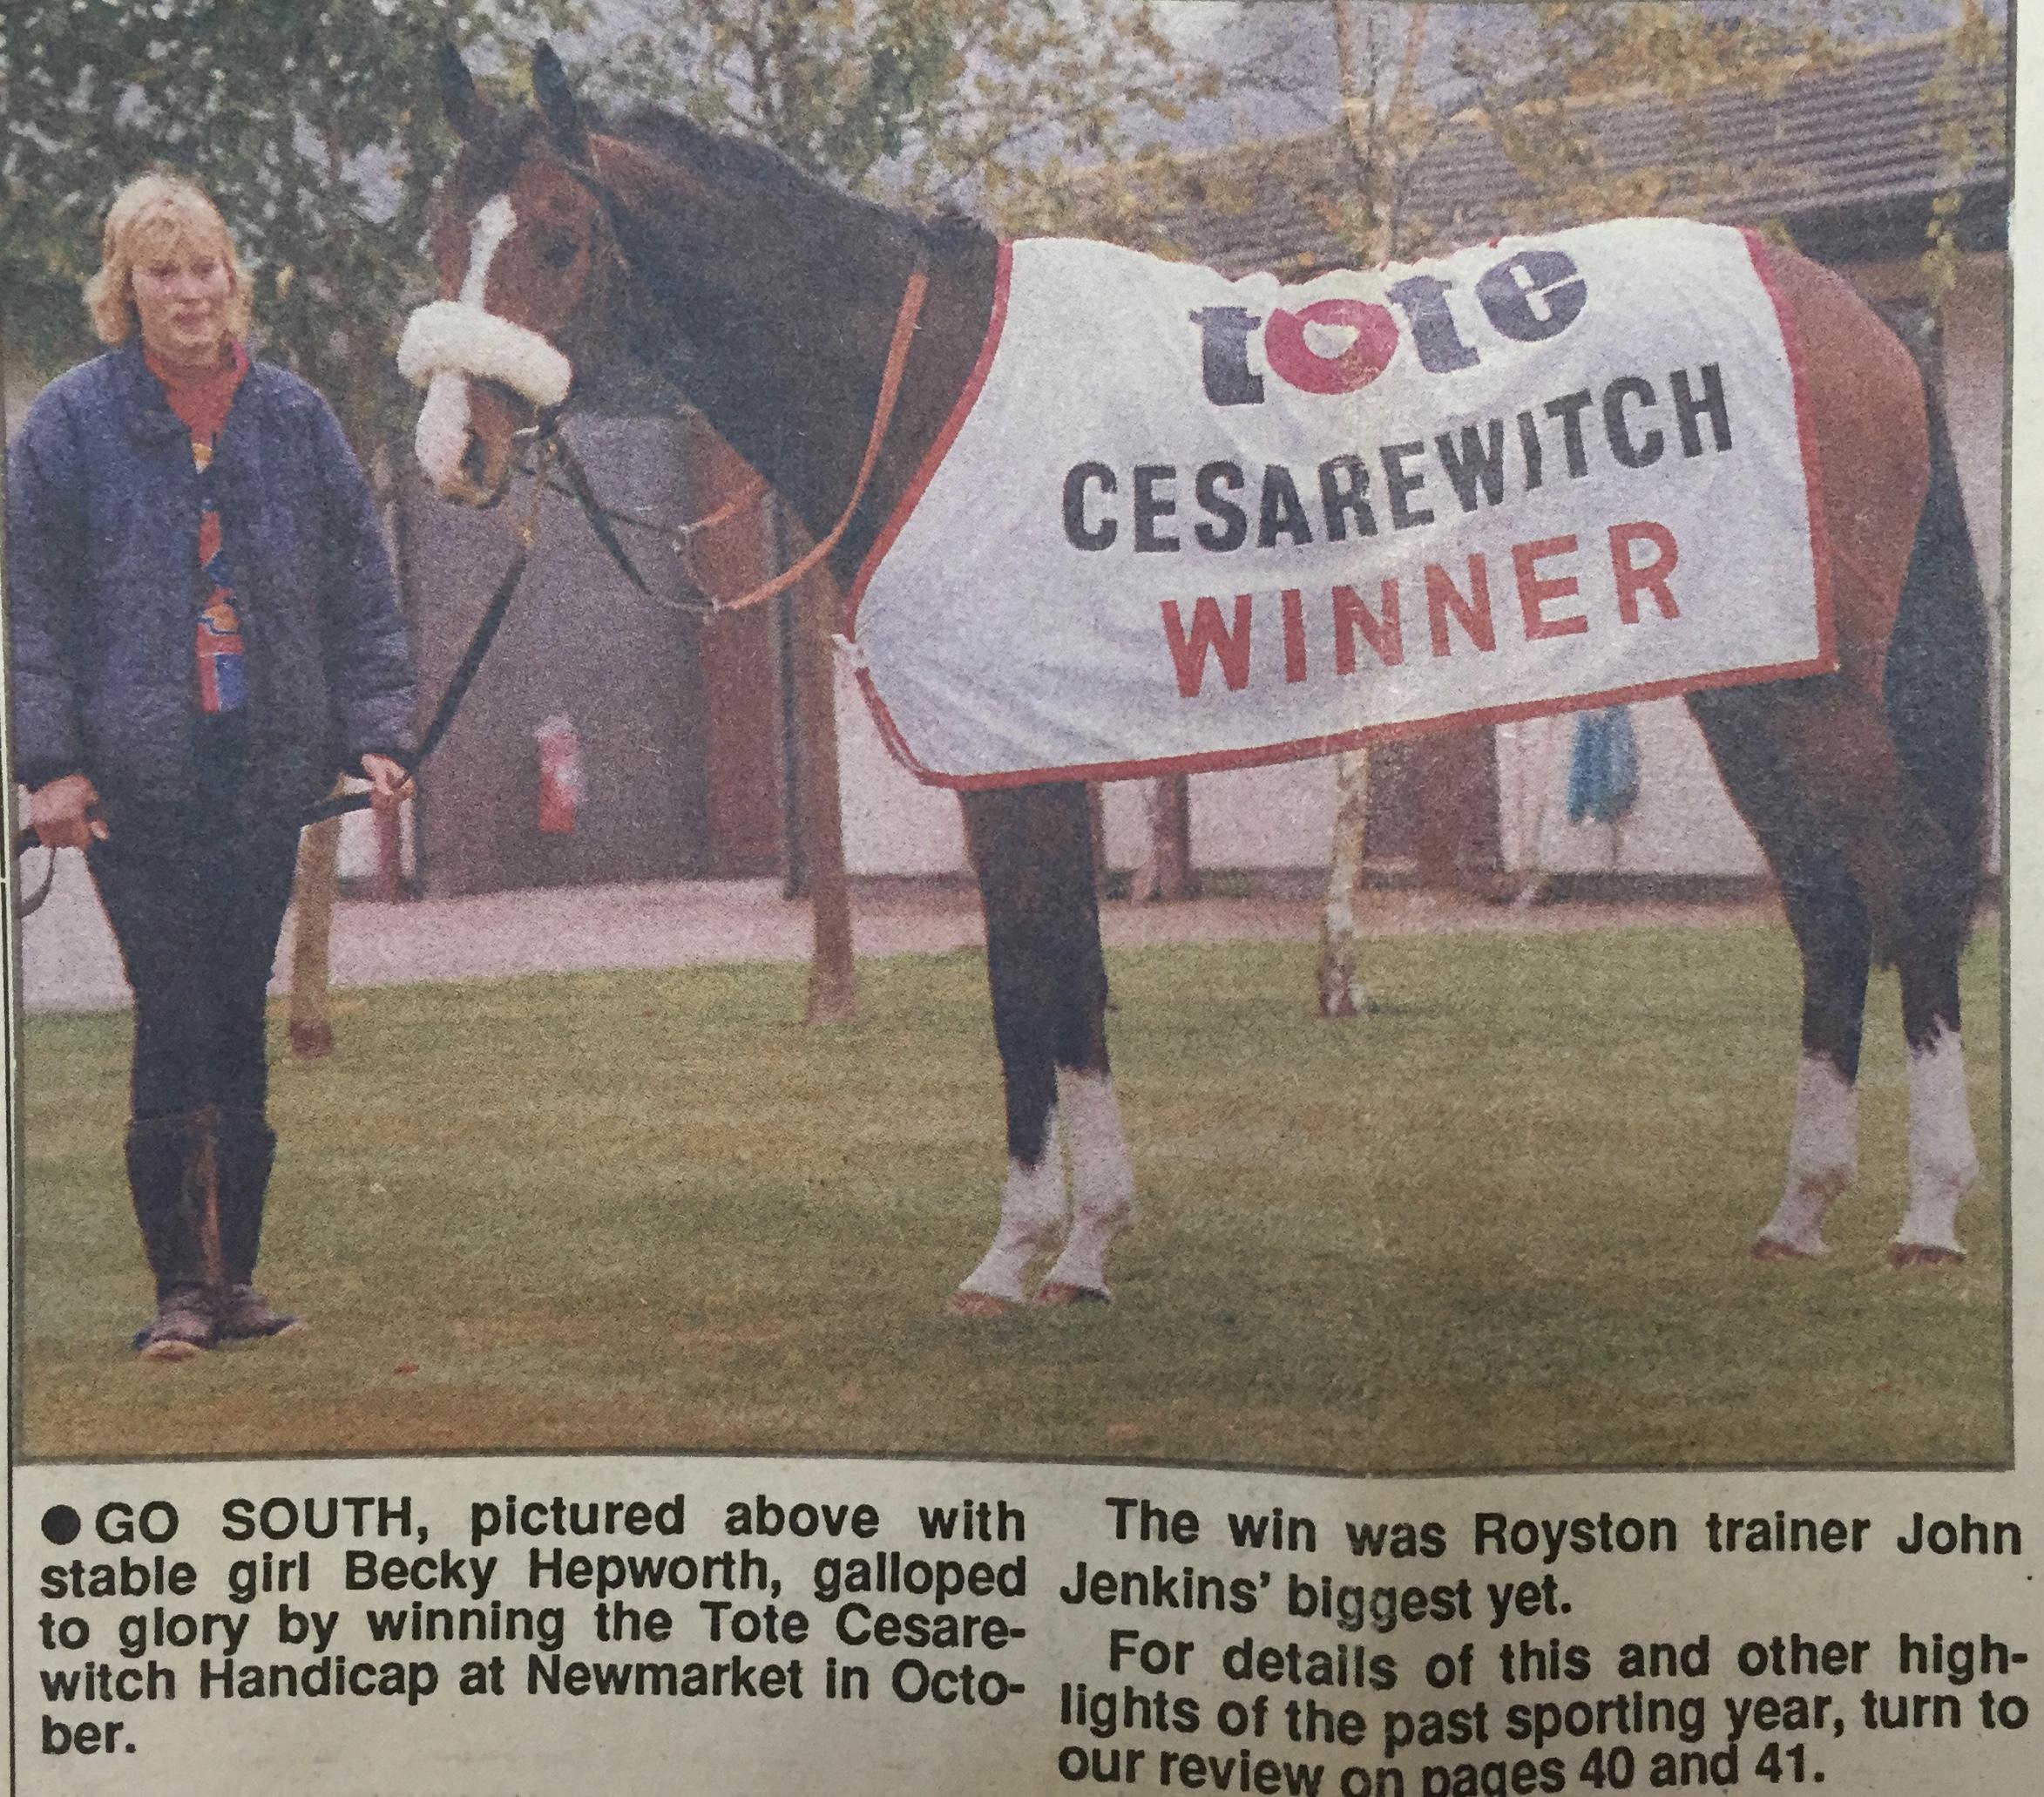 go south cesarewitch winner john jenkins racehorse trainer royston news